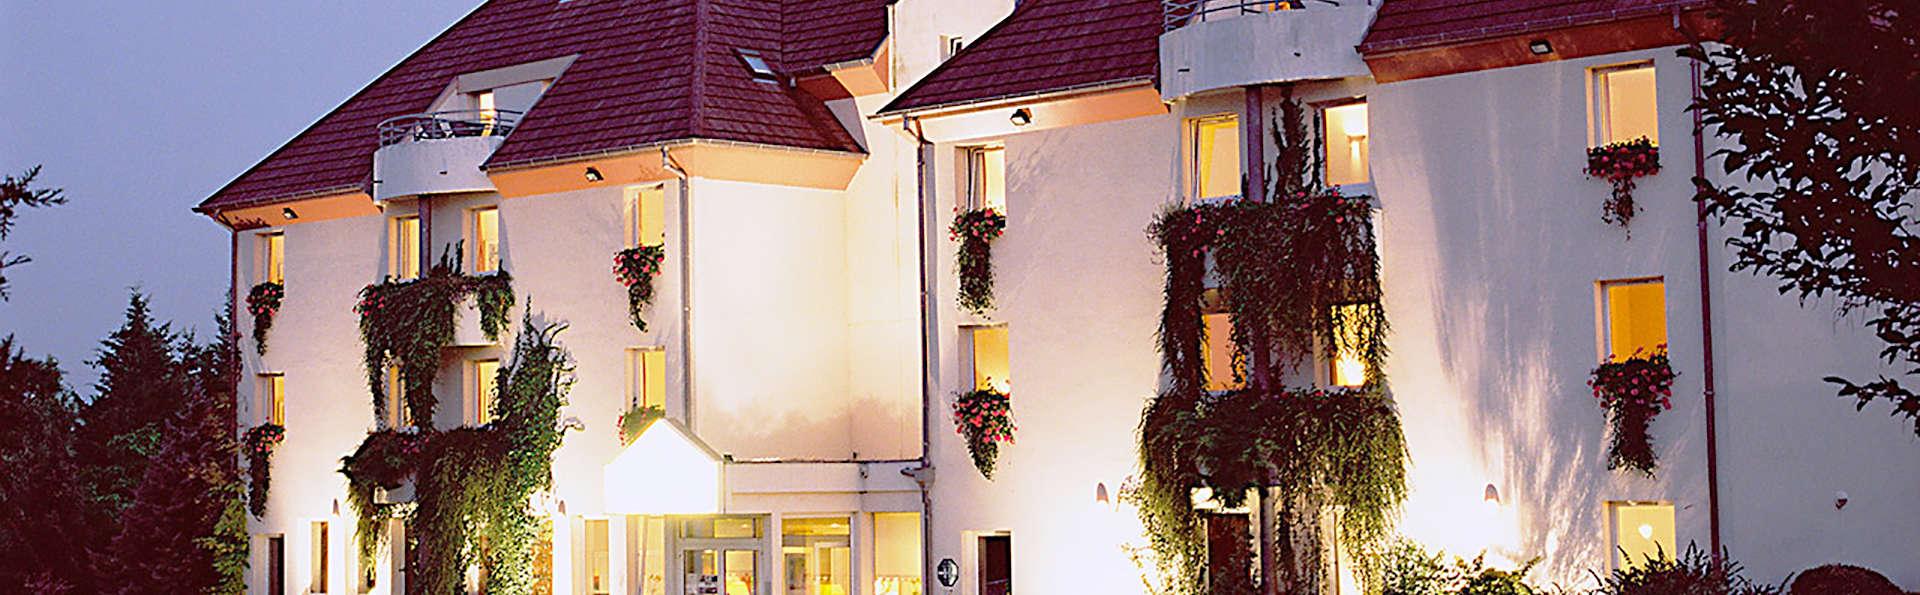 Hôtel Les Jardins d'Adalric - Obernai - edit_facade.jpg